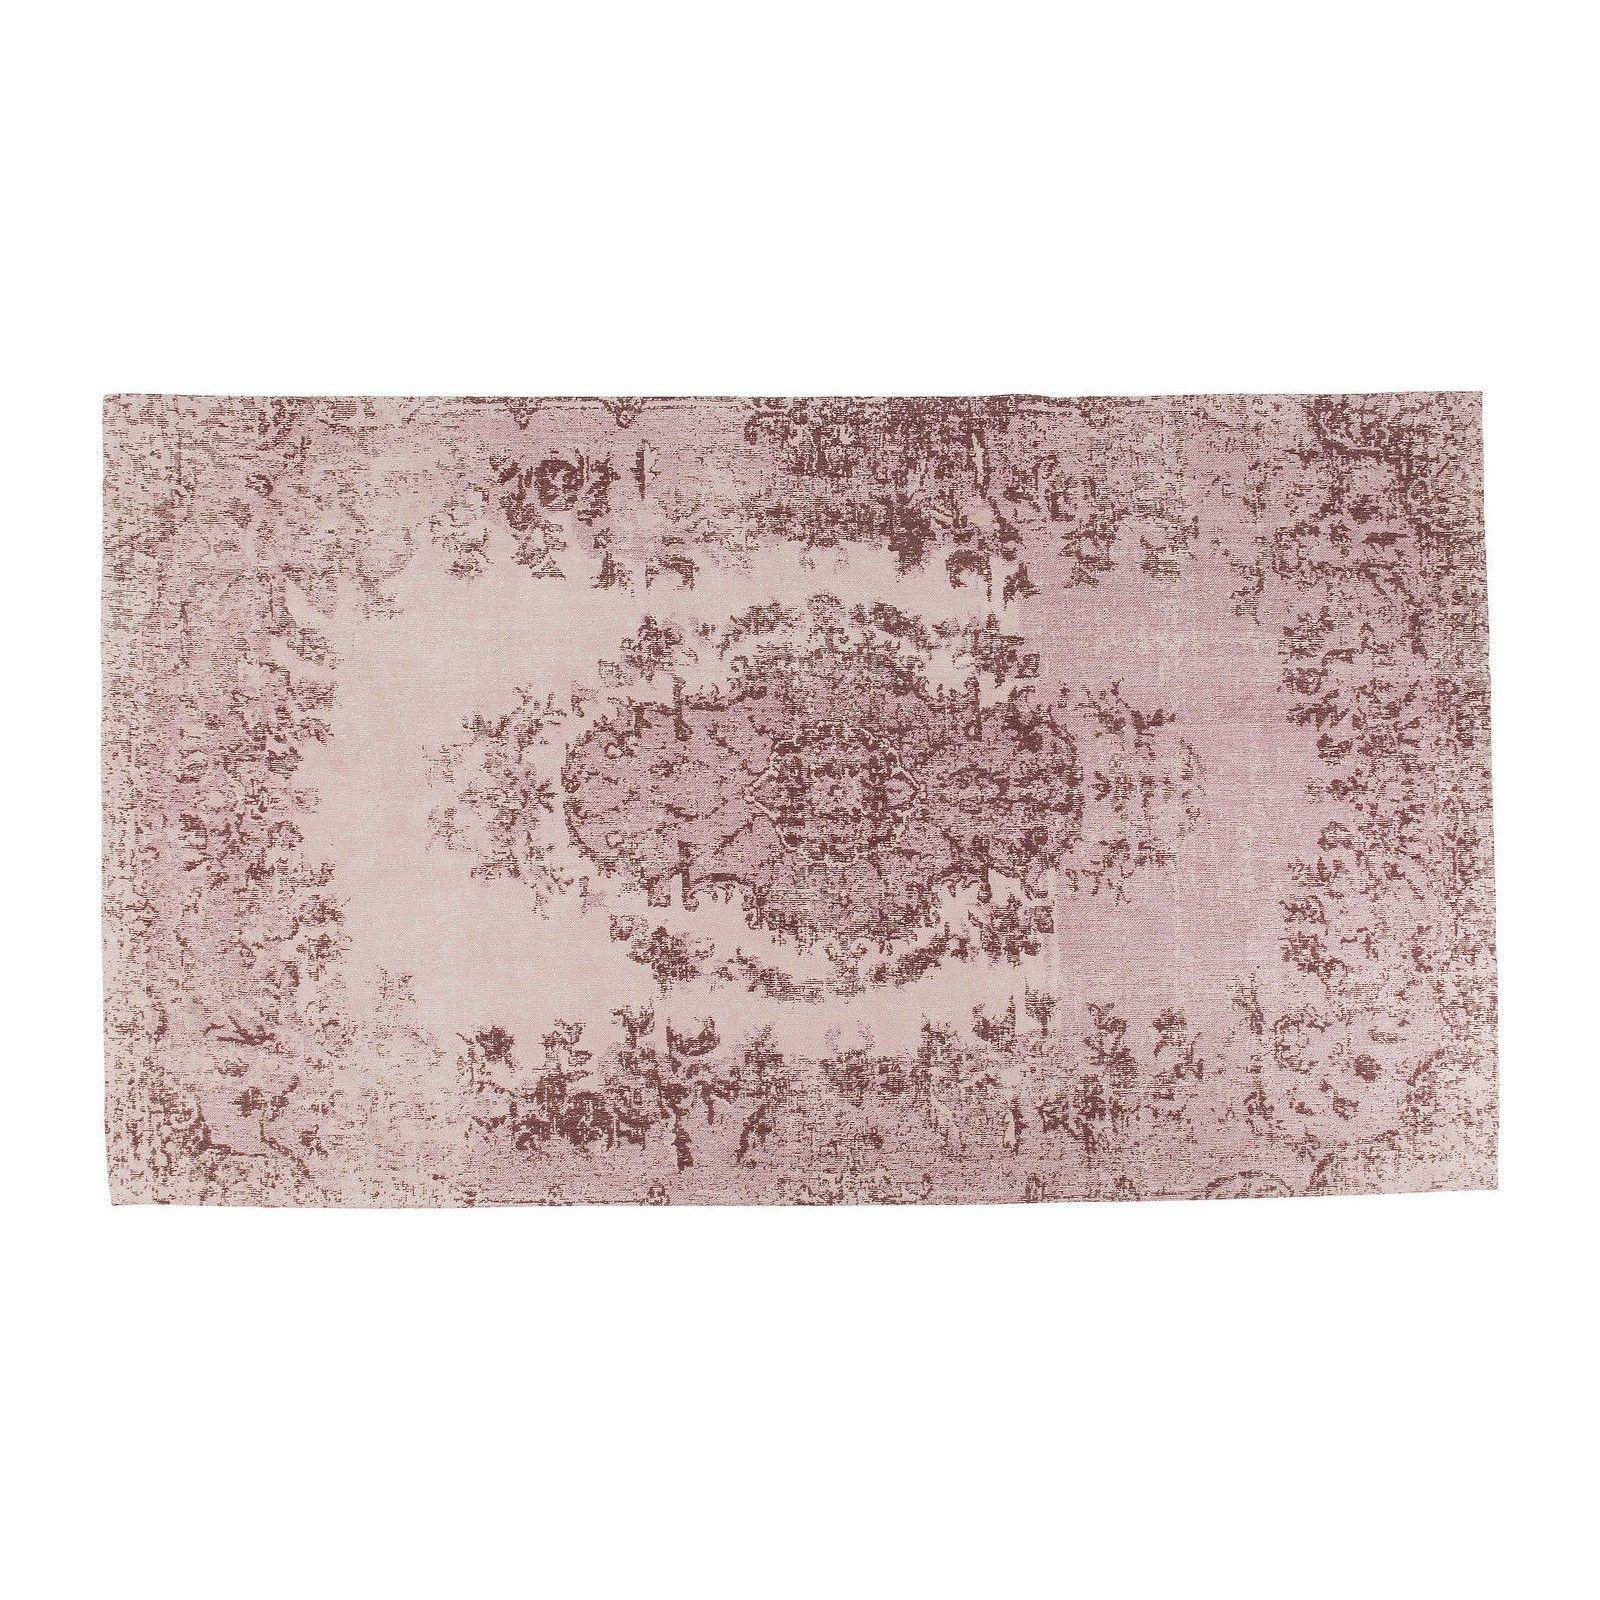 Tapis Baroque Rose Poudre Ornament Kare Design Tapis Tapis